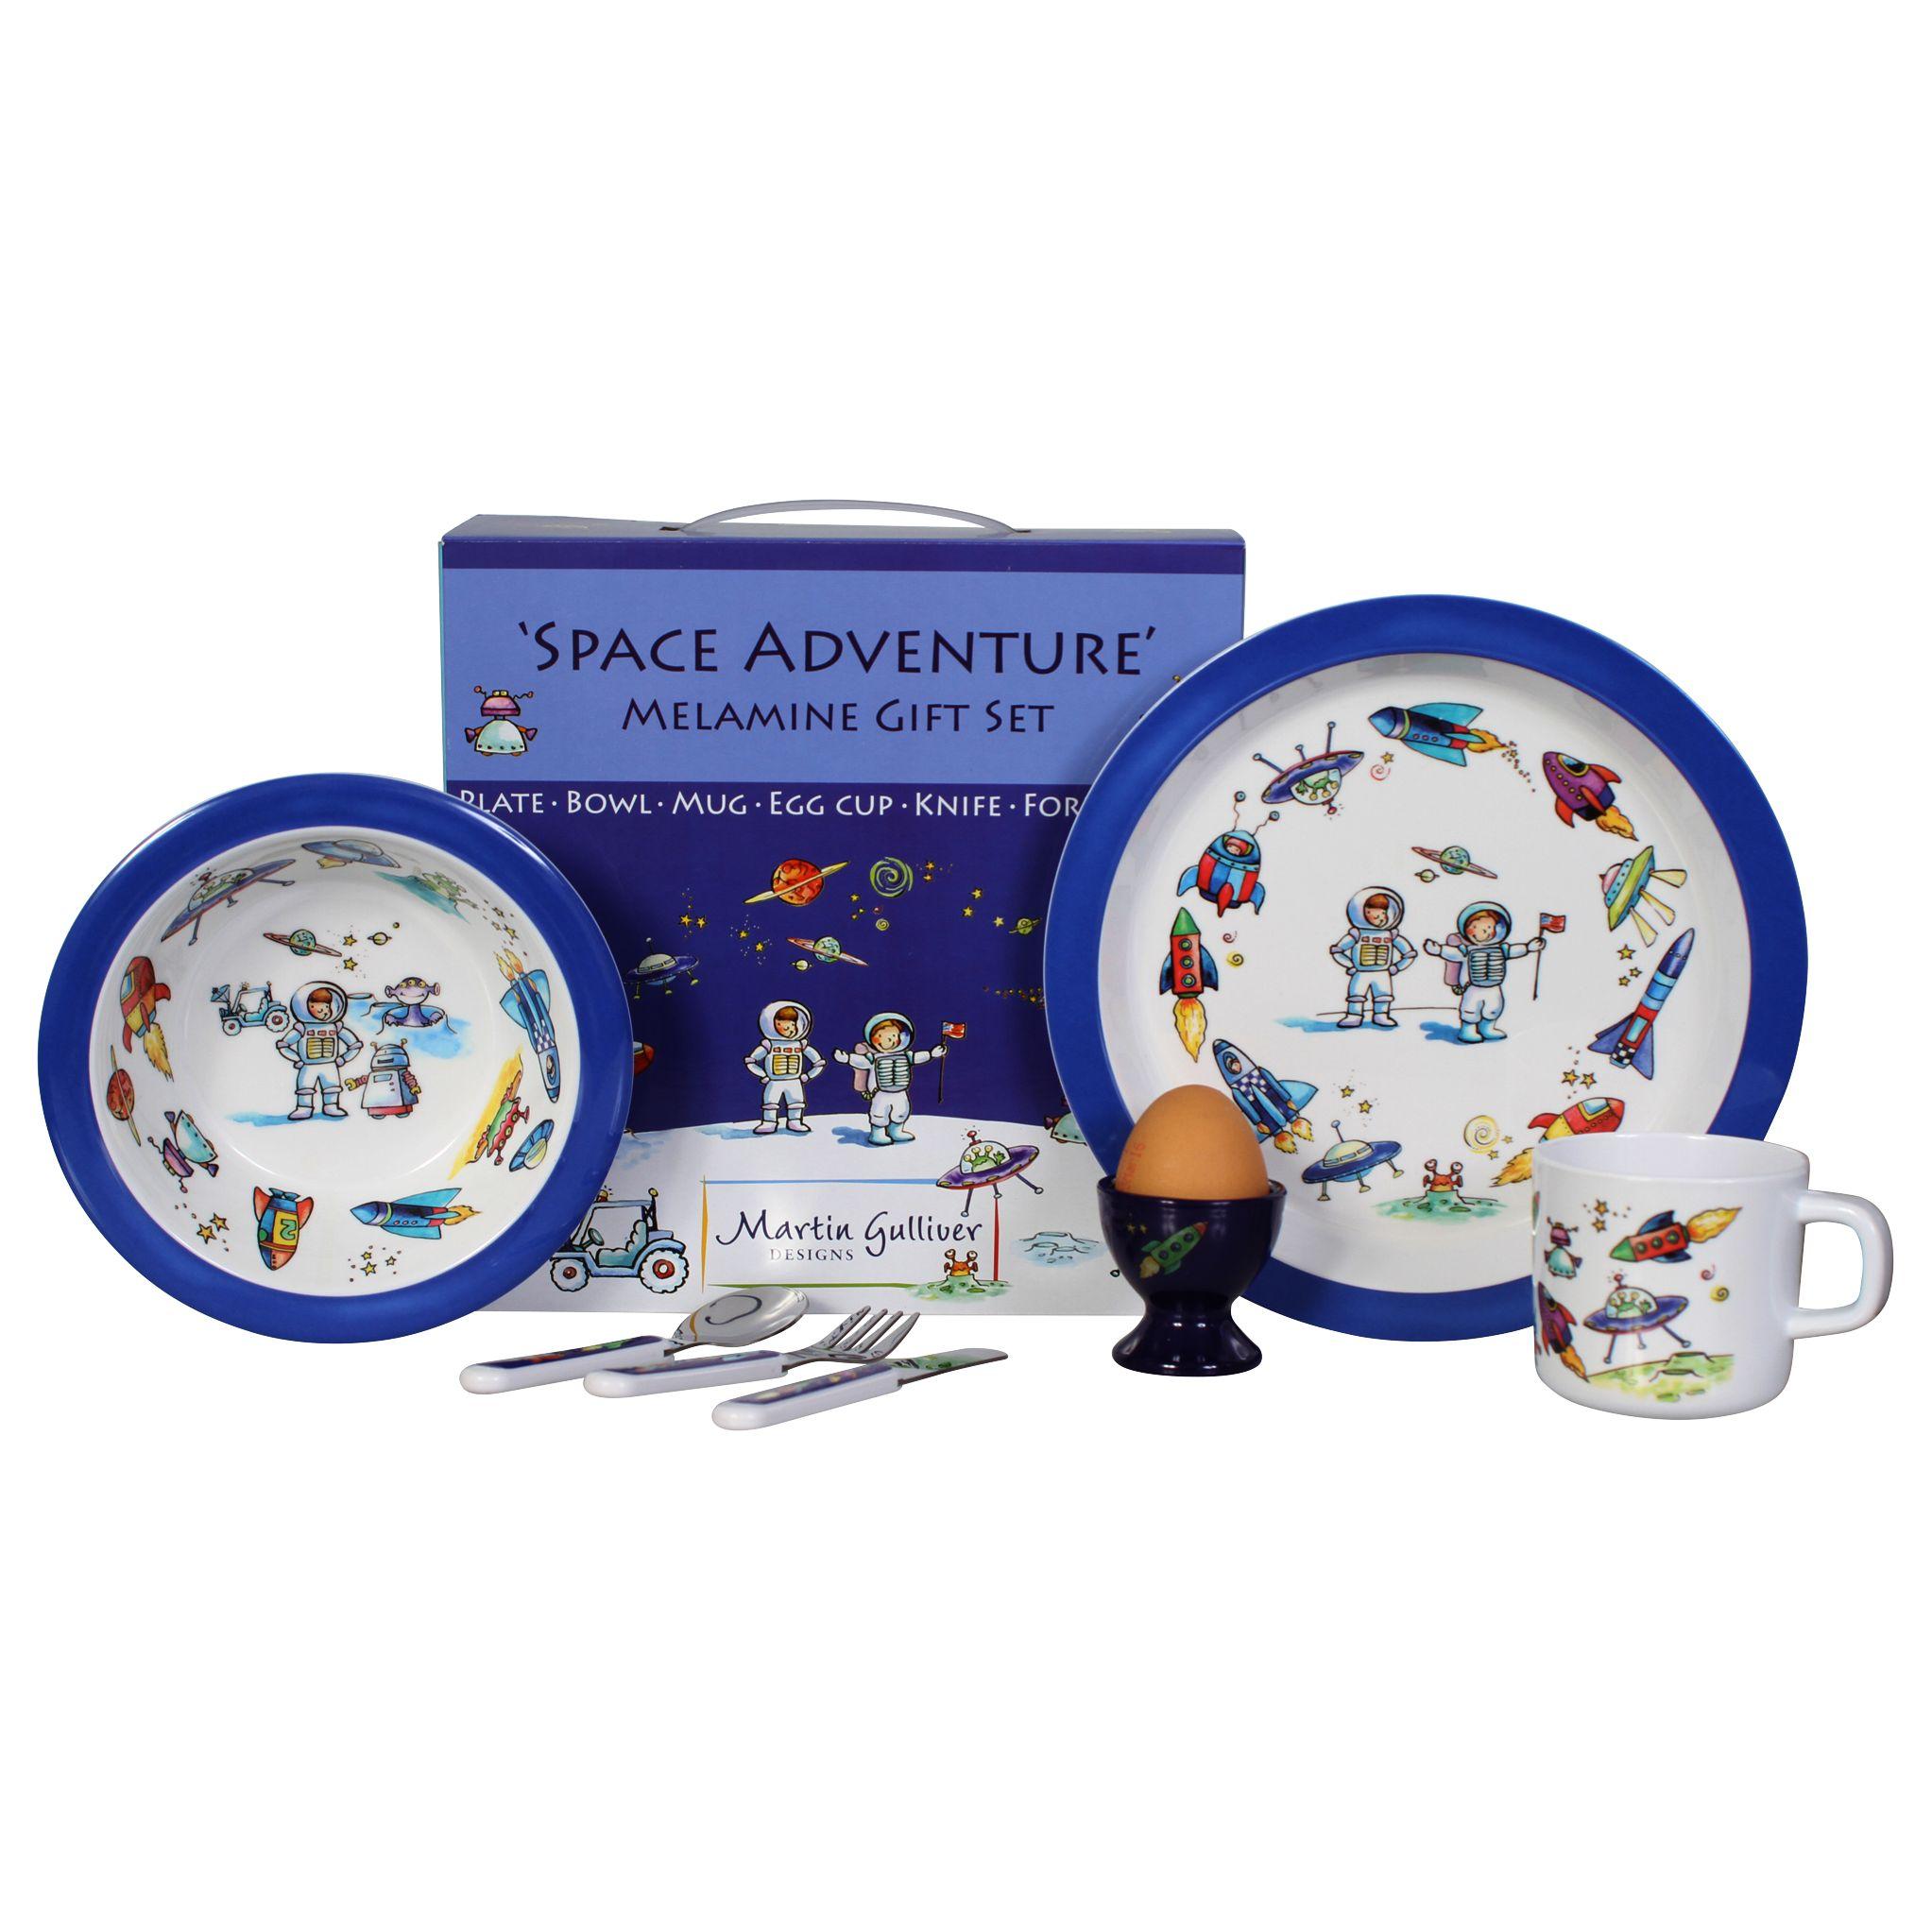 Martin Gulliver Martin Gulliver Space Adventure Melamine Dinner Set